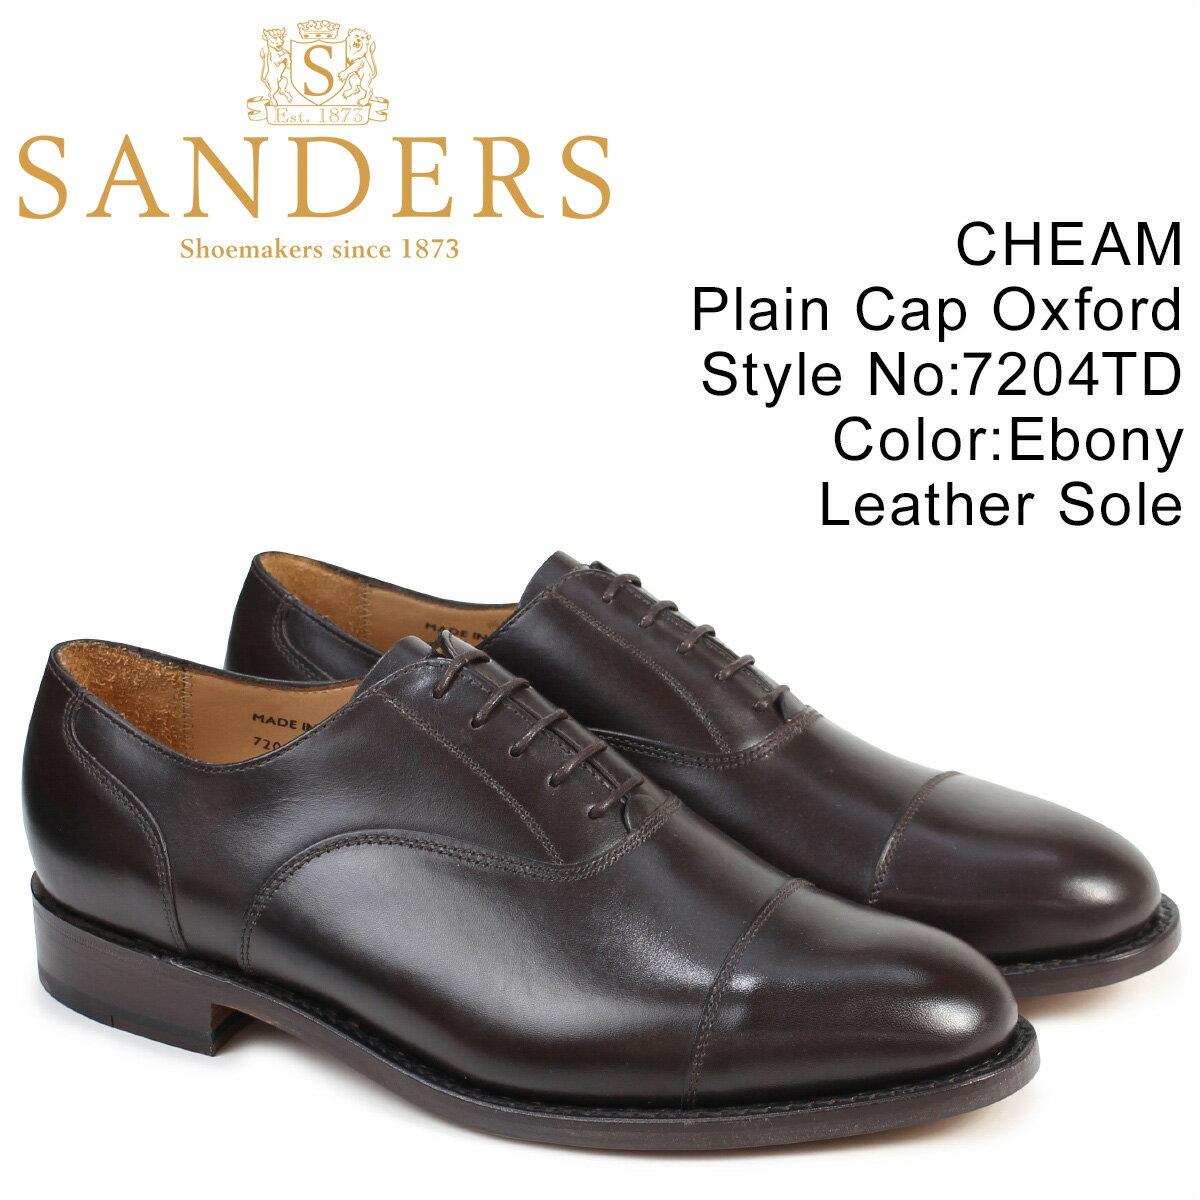 SANDERS 靴 サンダース ミリタリー オックスフォード シューズ ビジネス CHEAM 7204TD メンズ ダークブラウン